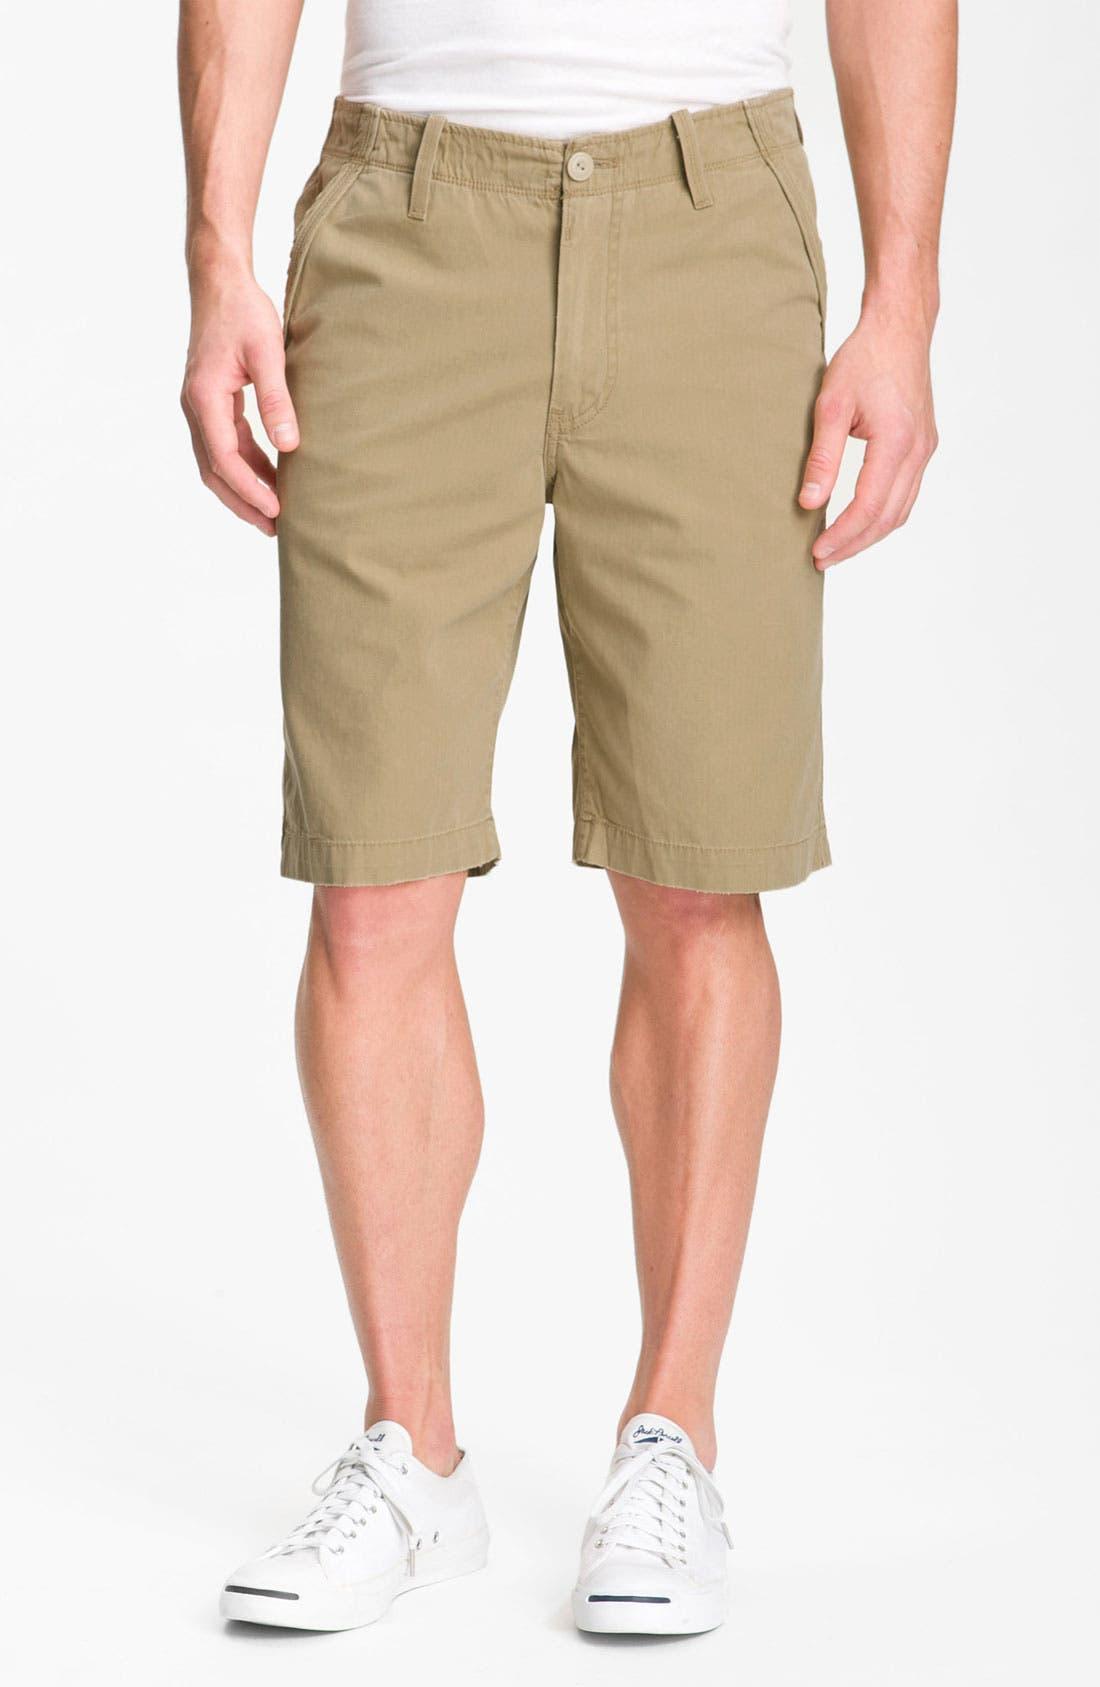 Alternate Image 1 Selected - Lucky Brand 'Carmel' Shorts